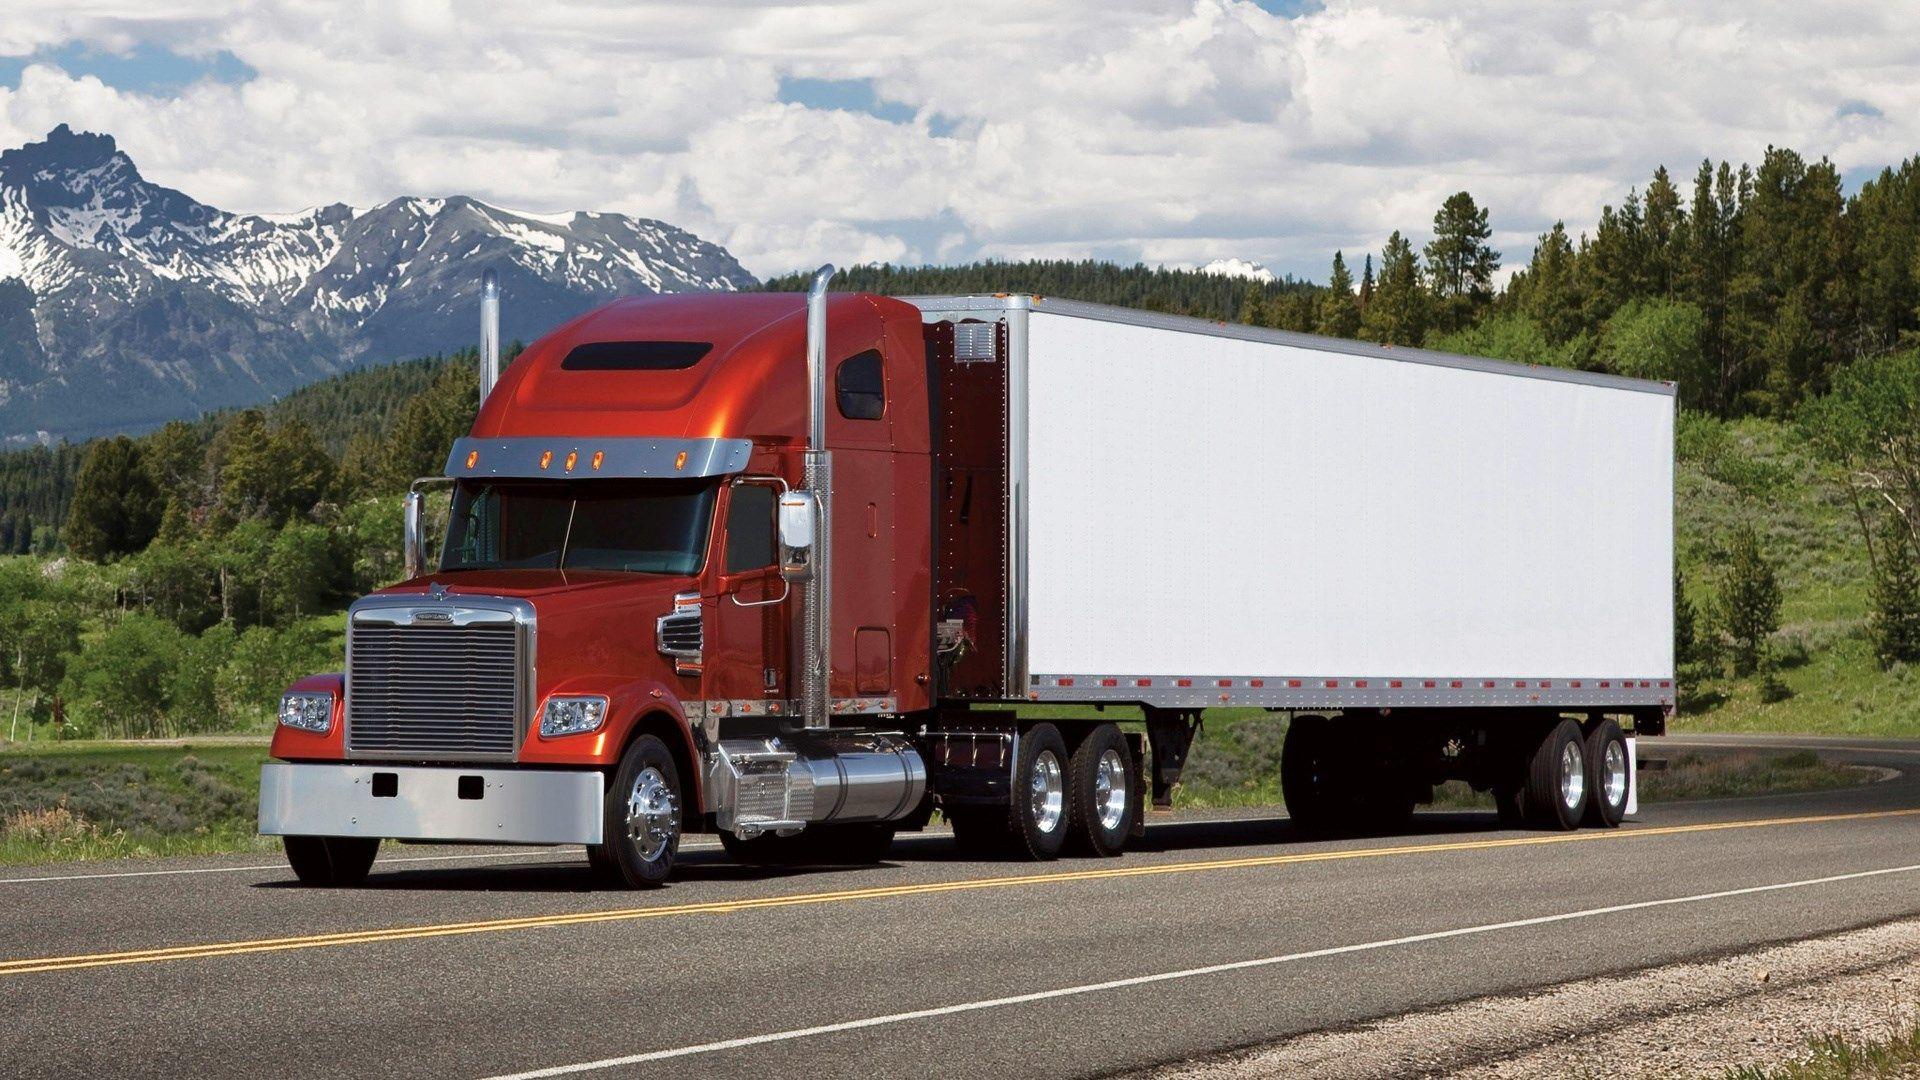 1920x1080 Hq Definition Wallpaper Desktop Freightliner Trucks Freightliner Freightliner Trucks